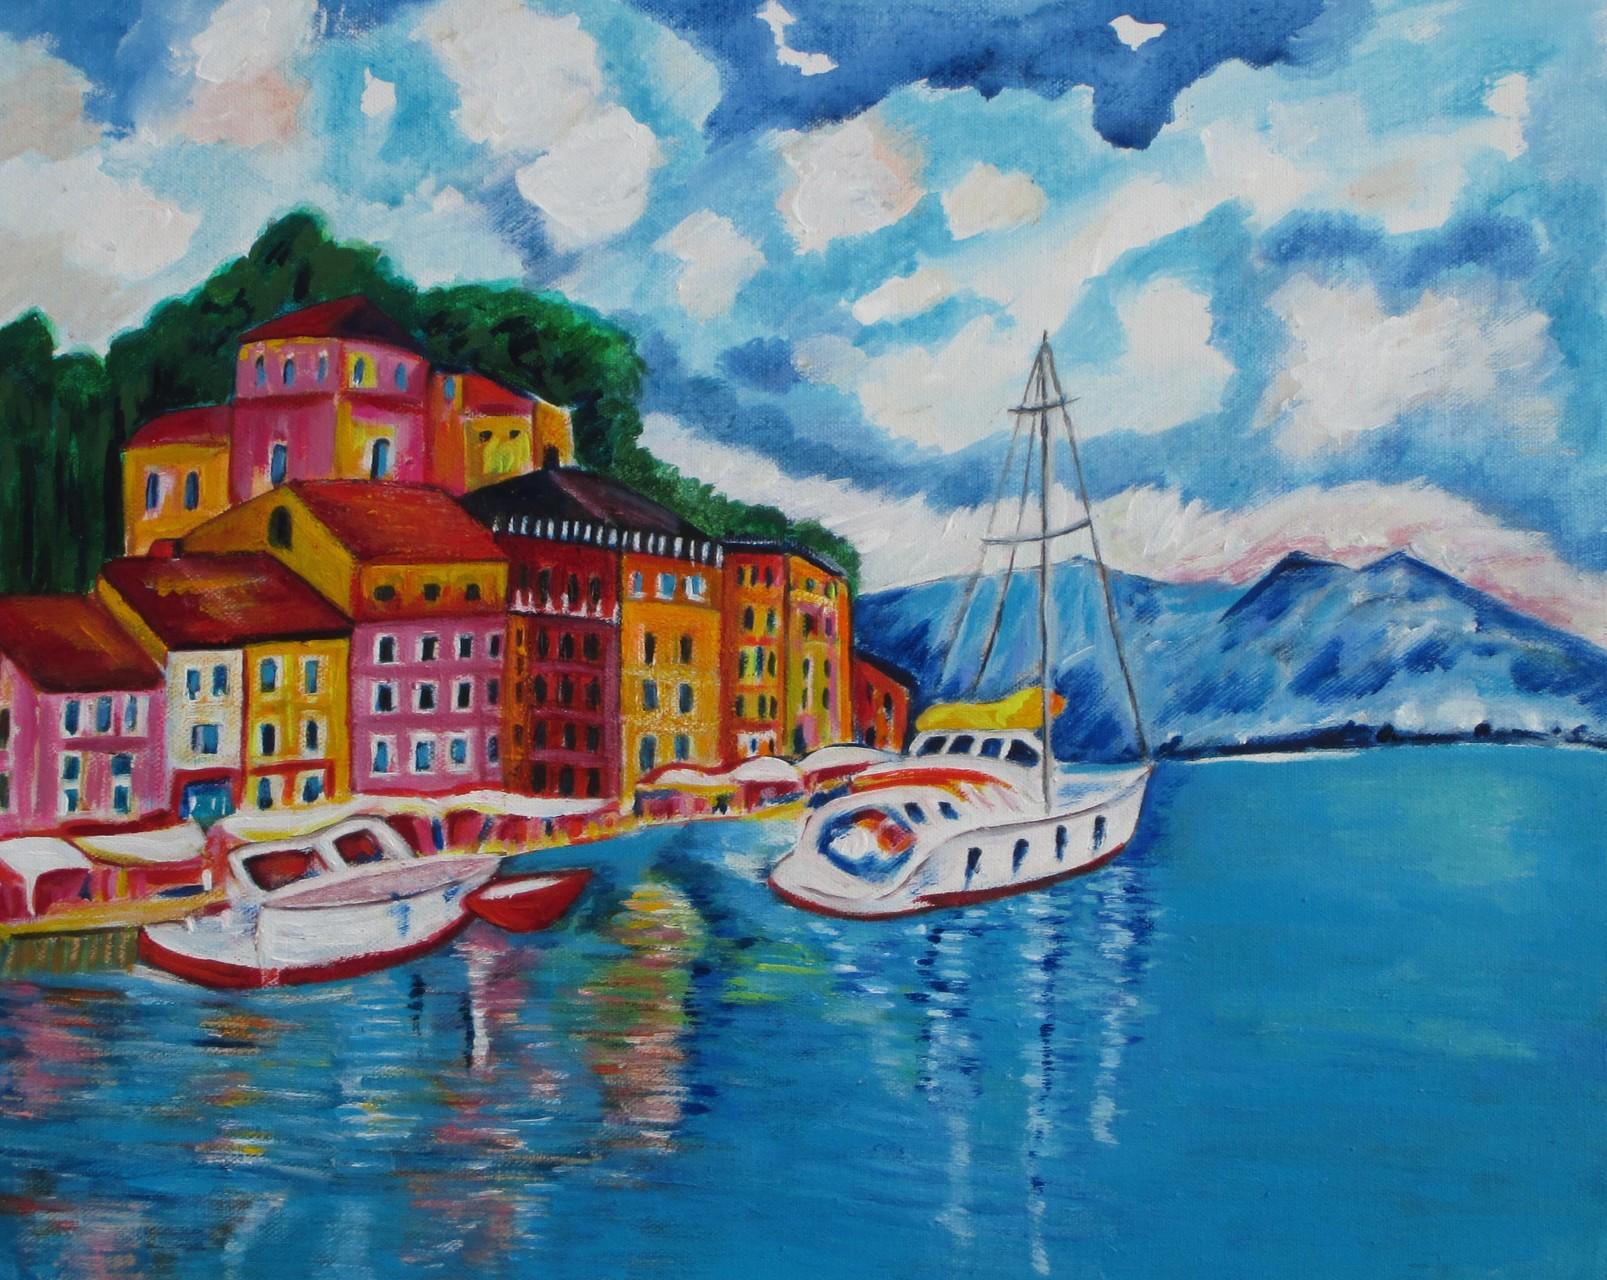 Portofino, acrylic on canvas, 20 x 16, SOLD